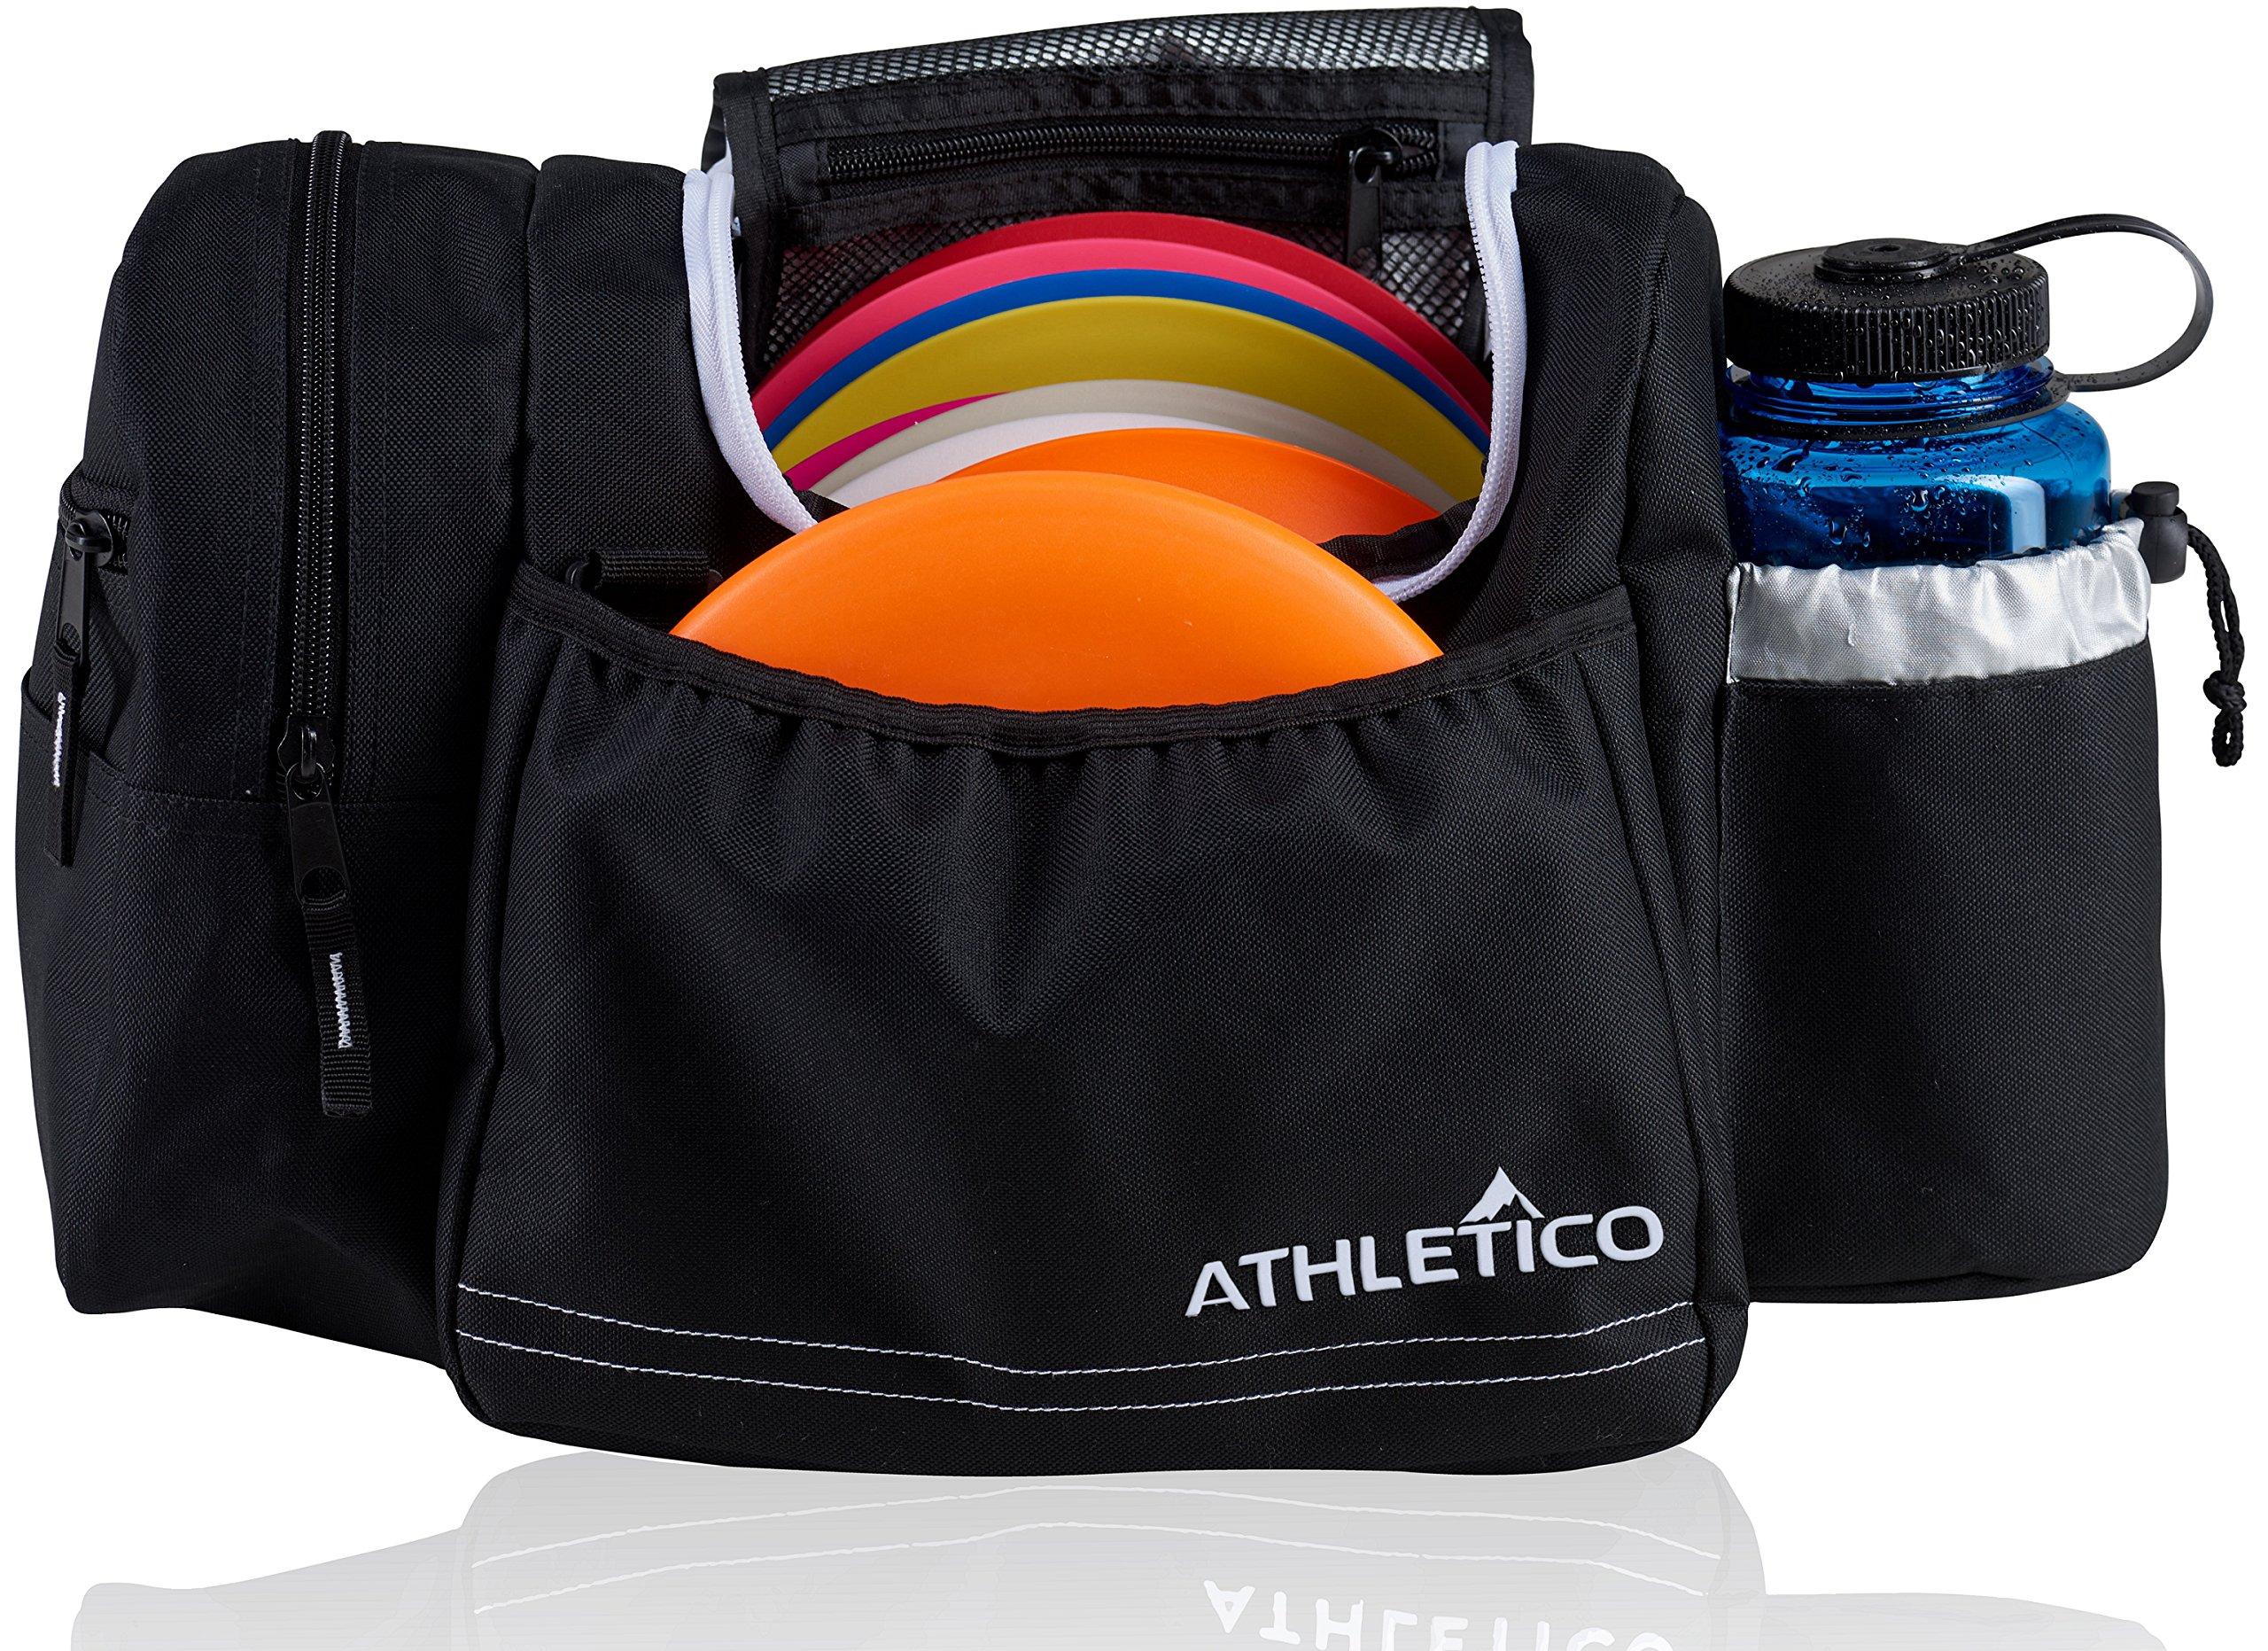 Athletico Disc Golf Bag Accessories